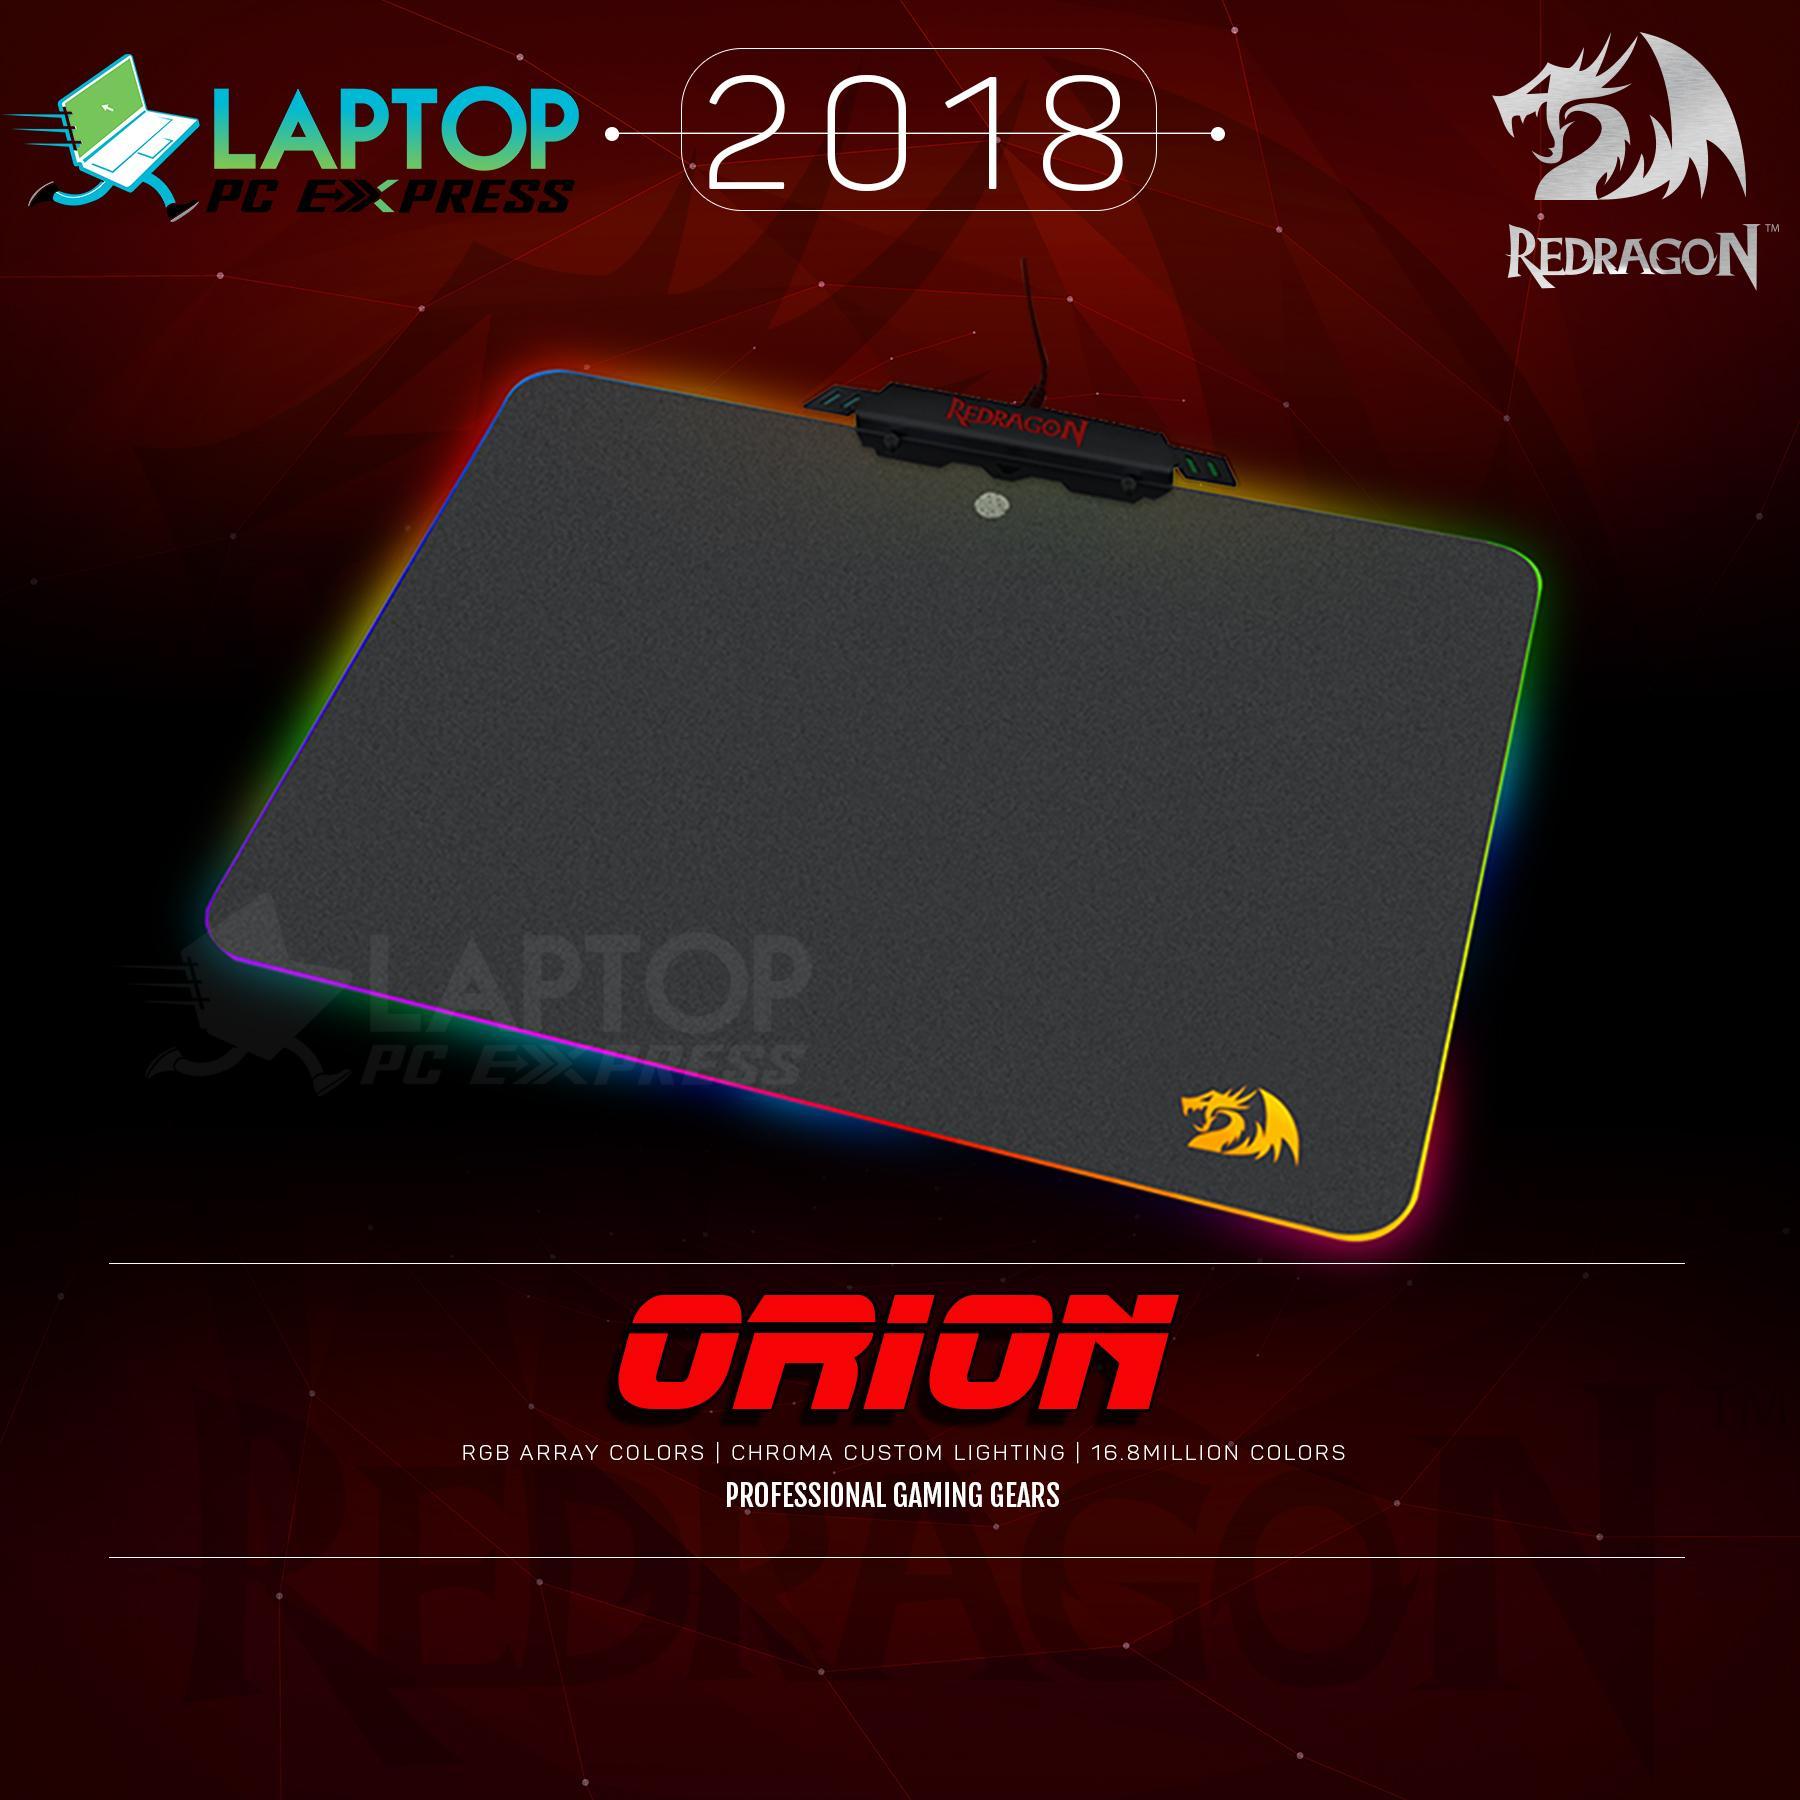 RGB Chroma Custom Lighting Gaming Mouse Pad Redragon Orion